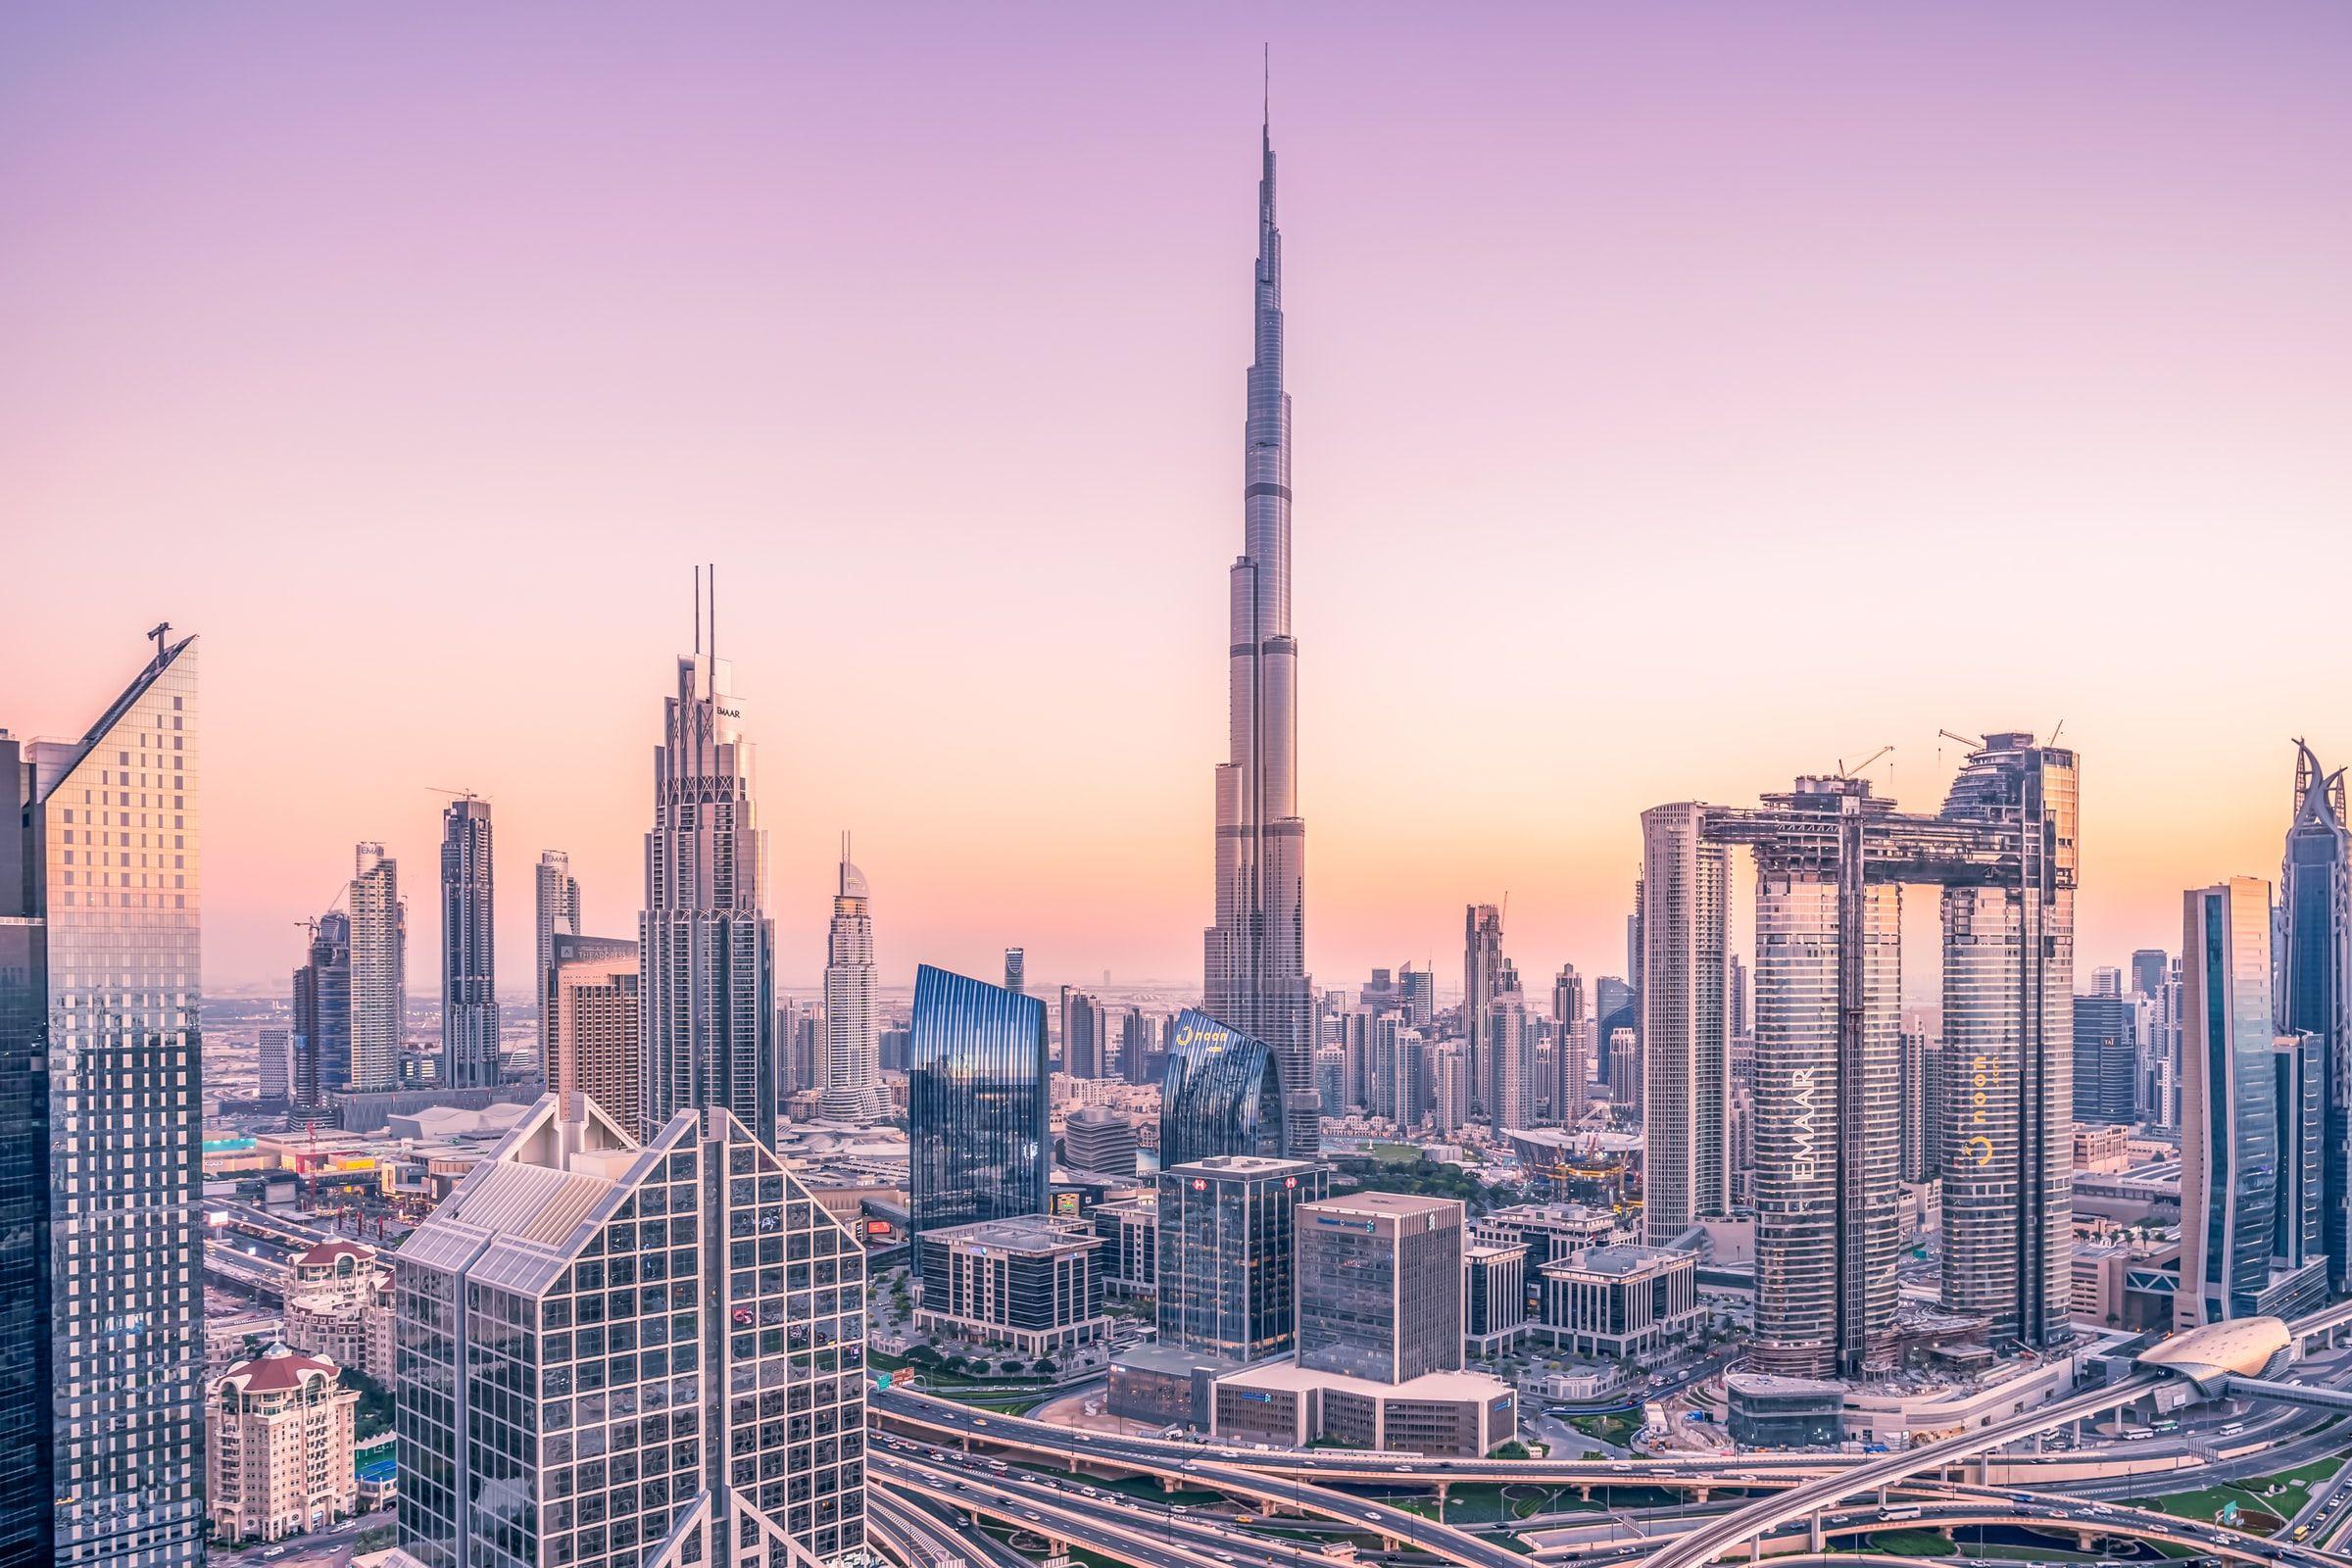 Arab World's sole unicorn is based in UAE